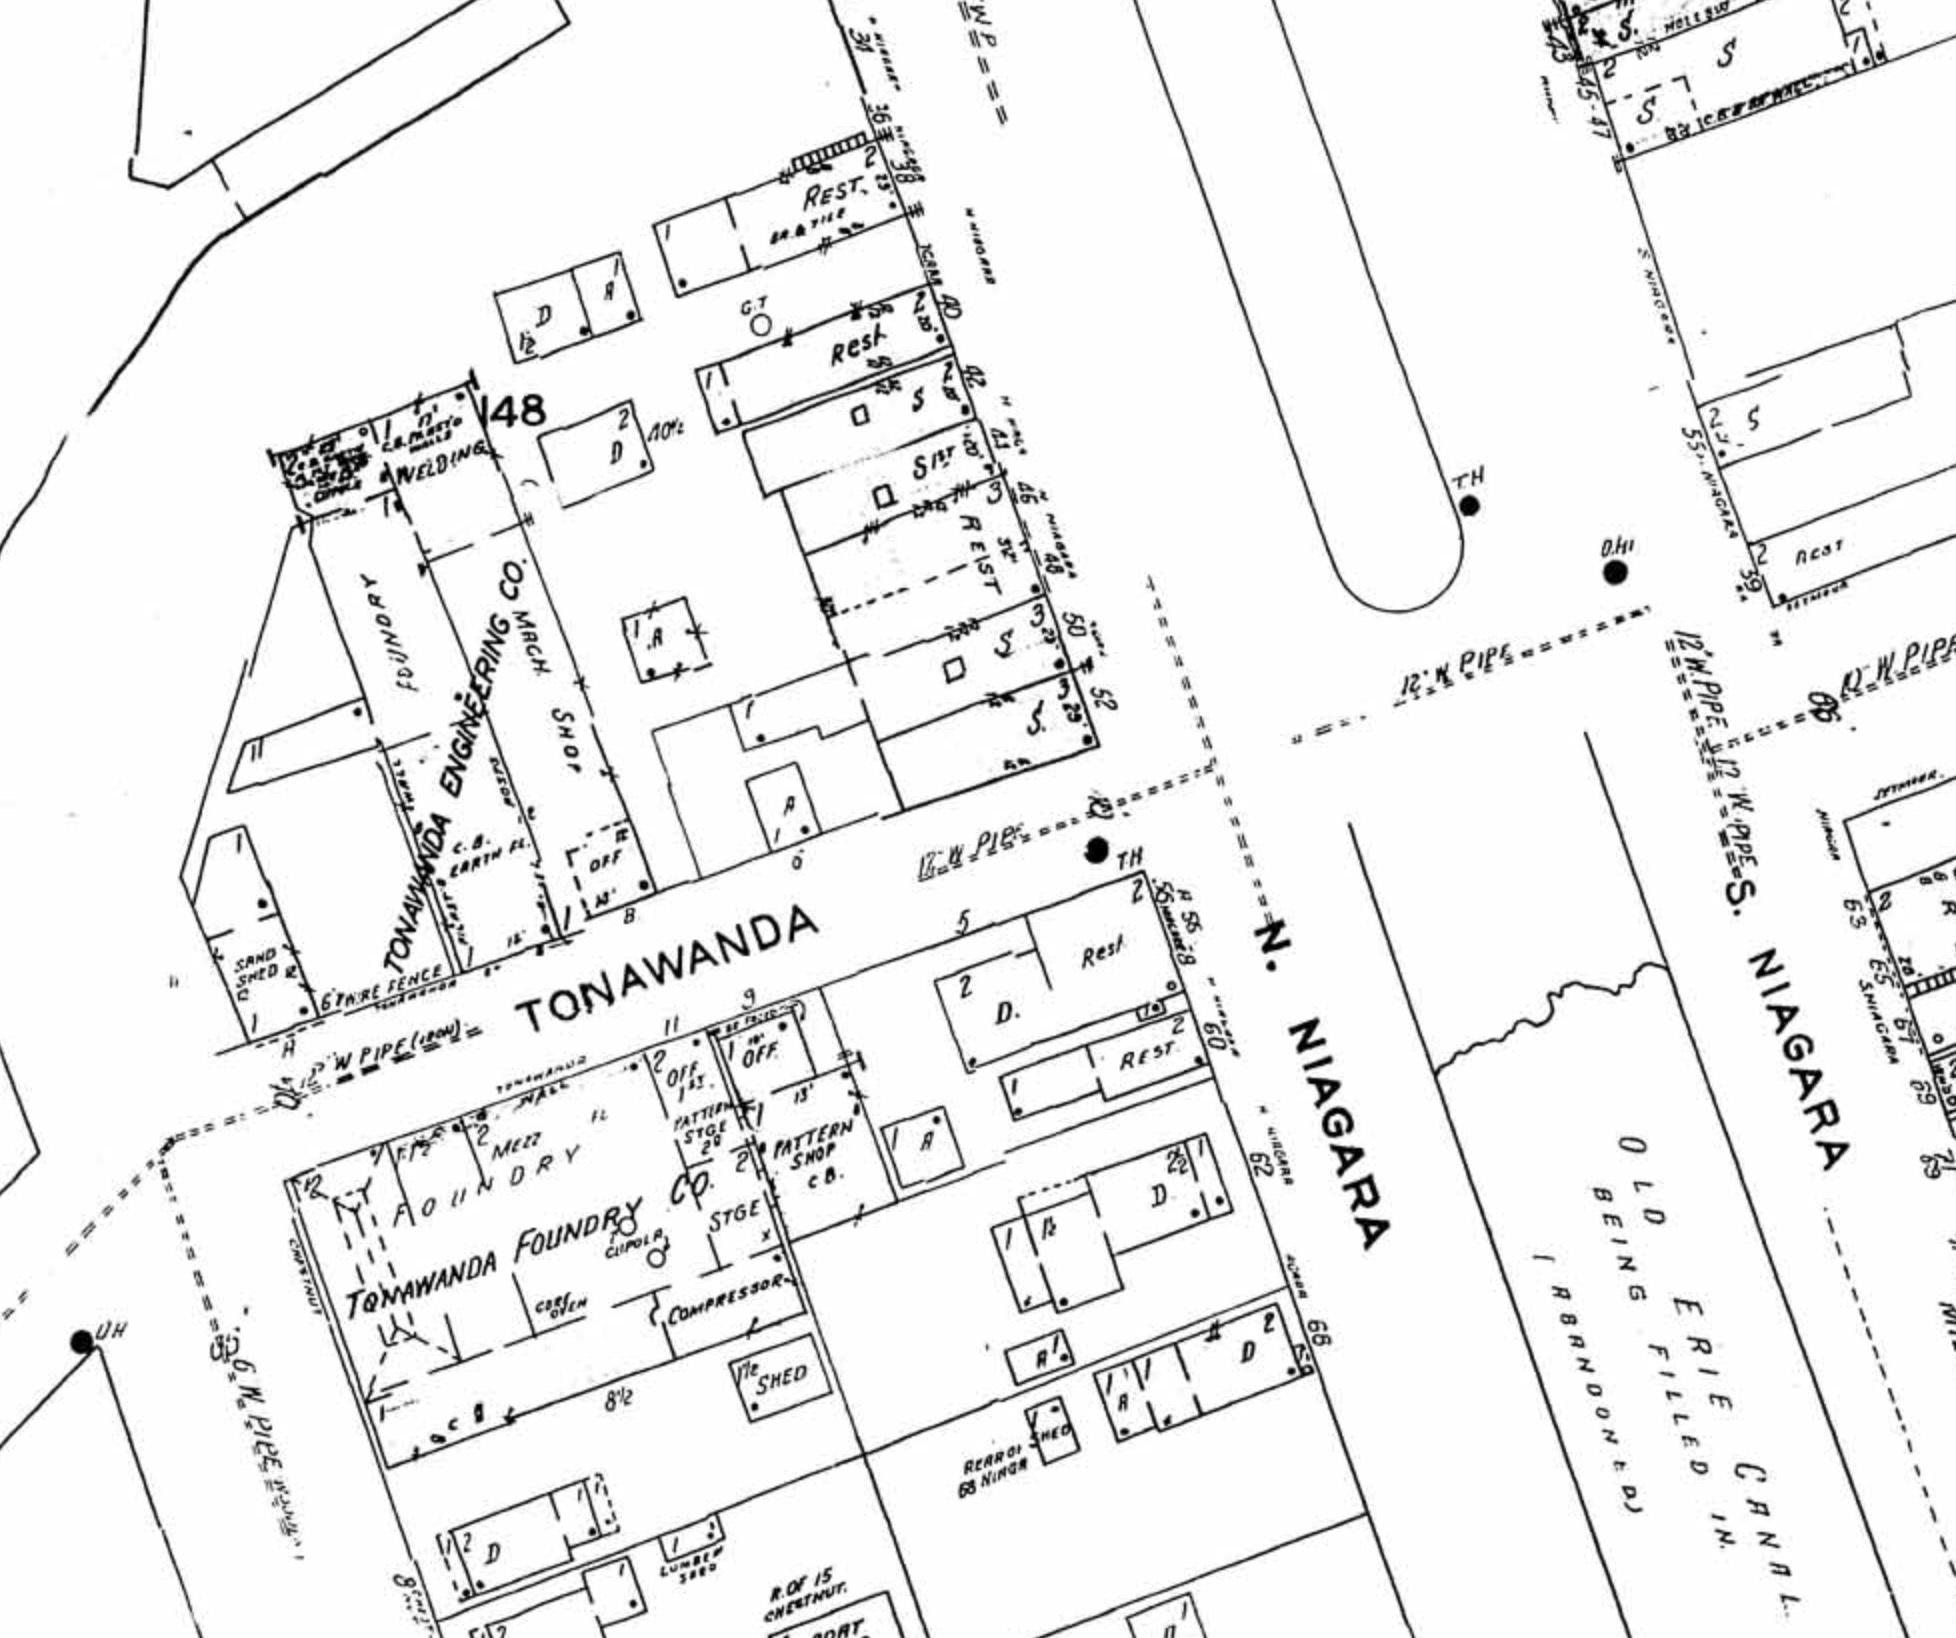 Tonawanda Engineering Co., map (Sanborn Insurance Map, 1951).jpg